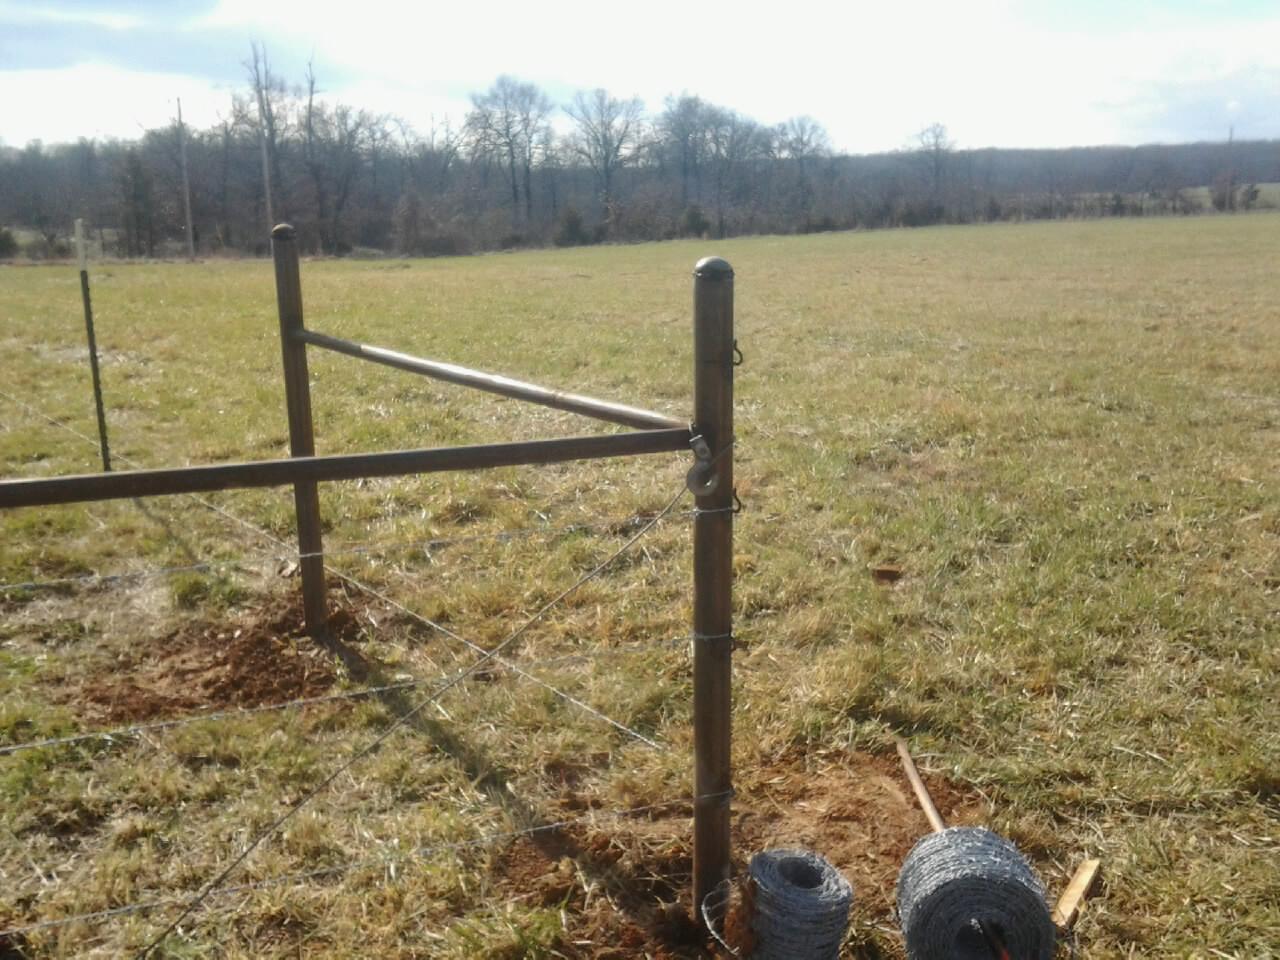 corner post of fence